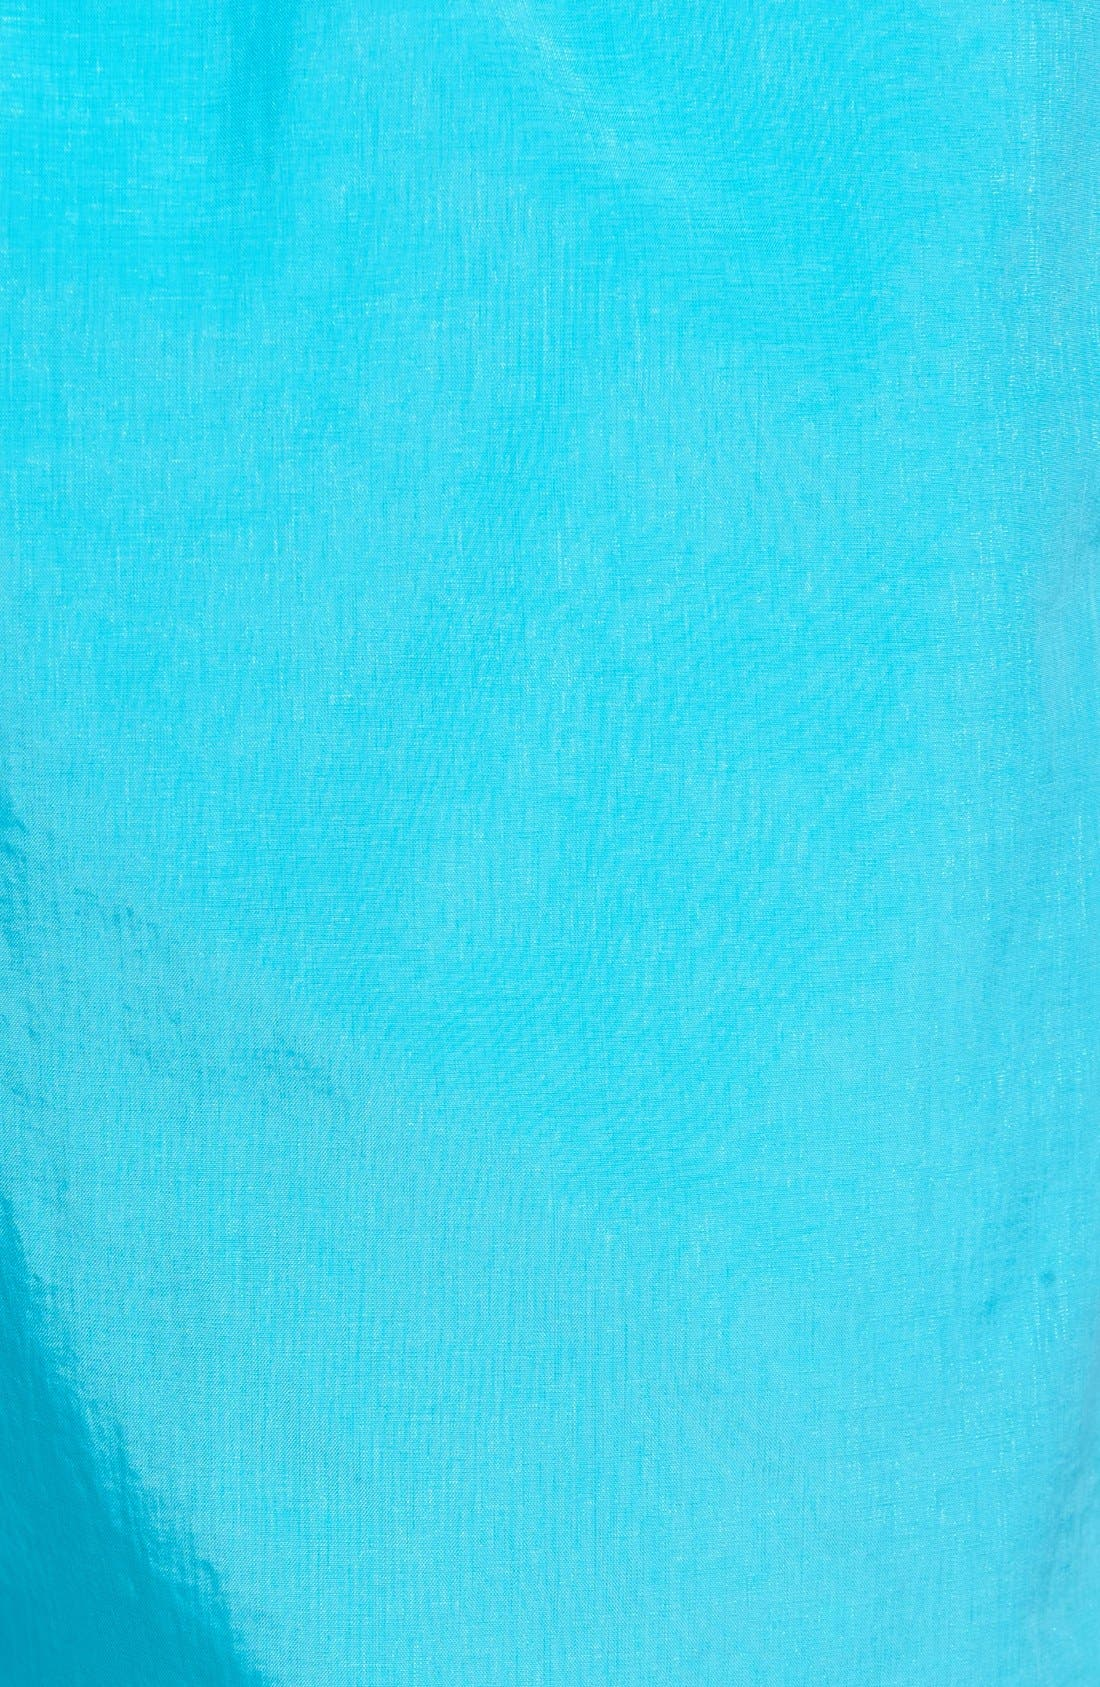 Cerulean Solid Swim Trunks,                             Alternate thumbnail 5, color,                             Cerulean